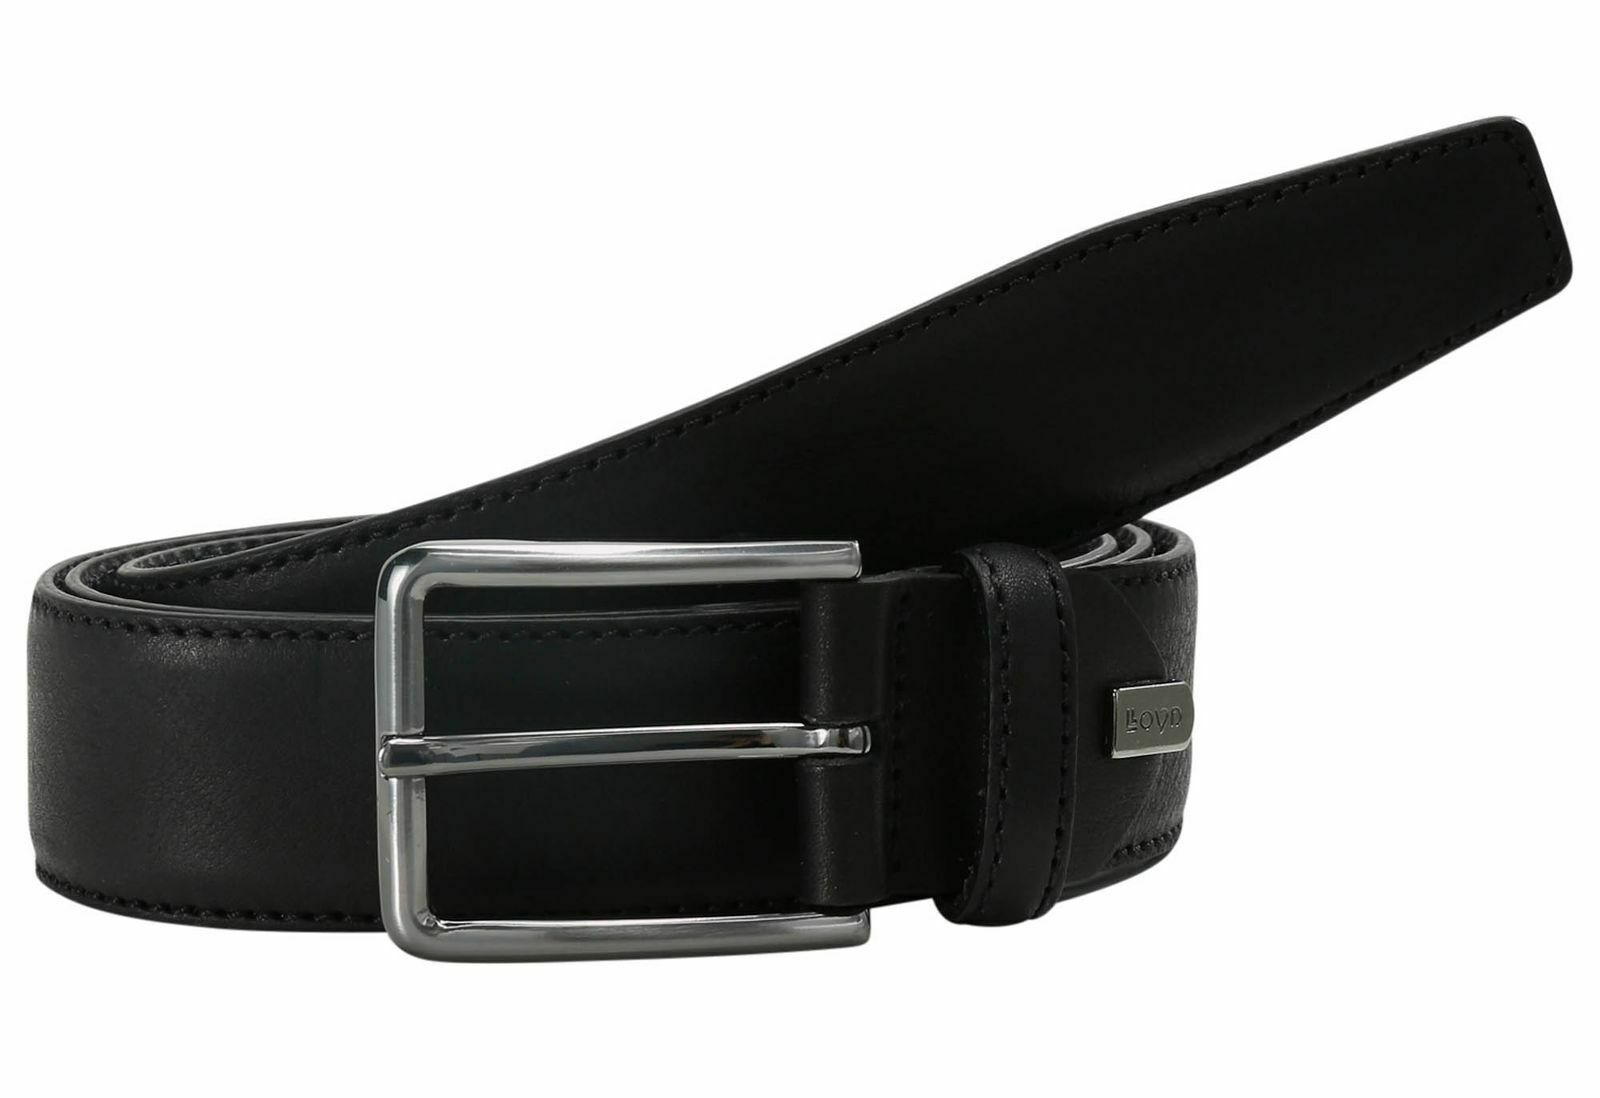 LLOYD Shortenable Belt W120 Gürtel Accessoire Black Schwarz